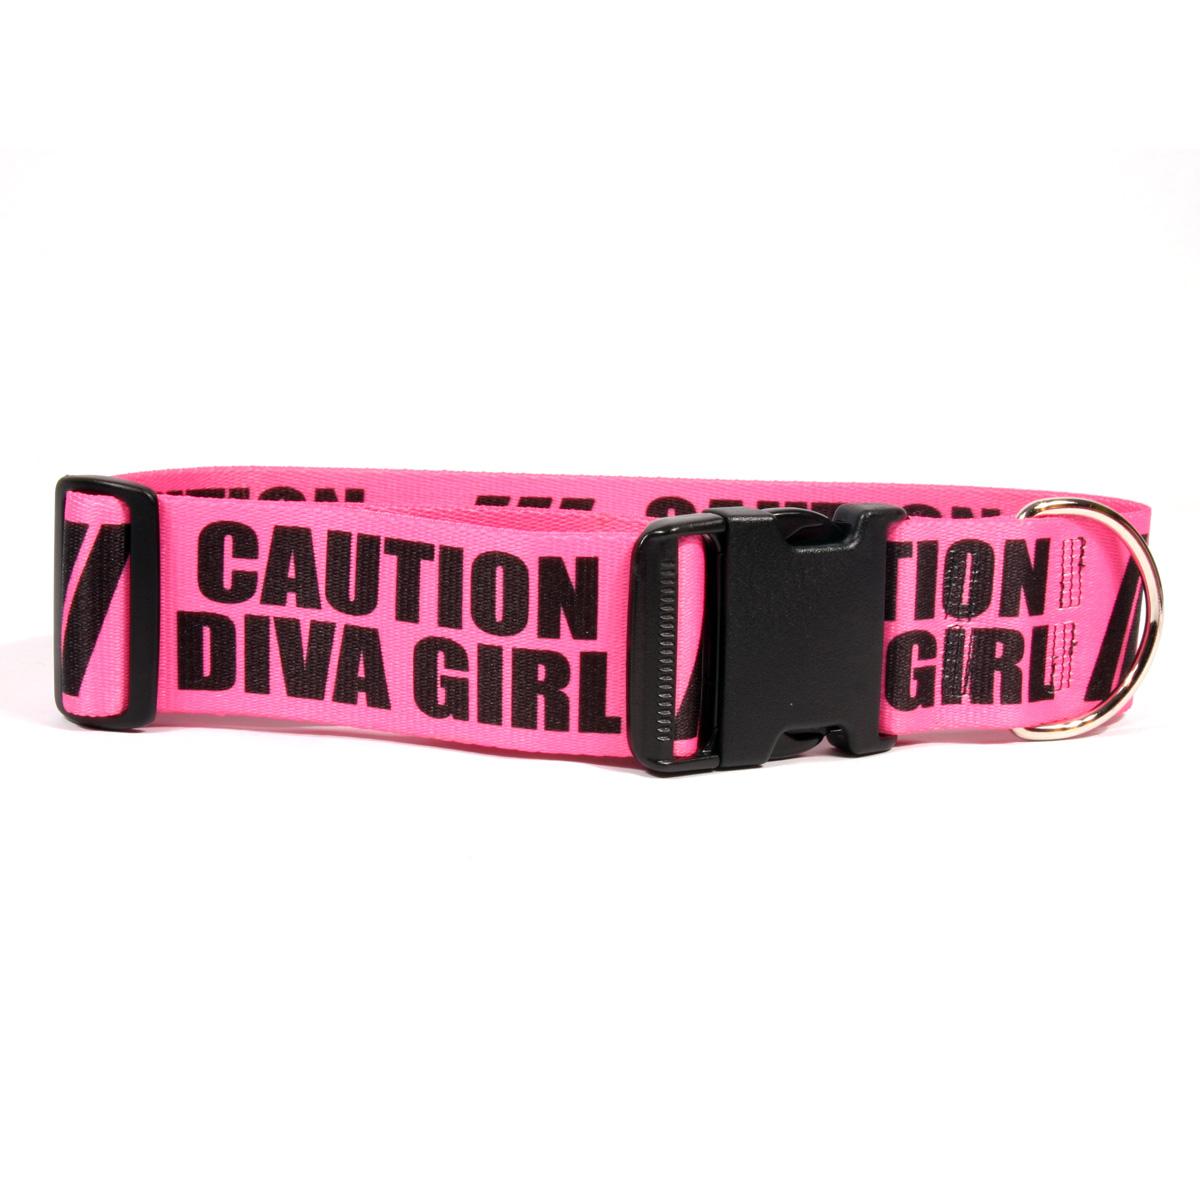 Yellow Dog 2 Inch - Caution Diva Girl Dog Collar